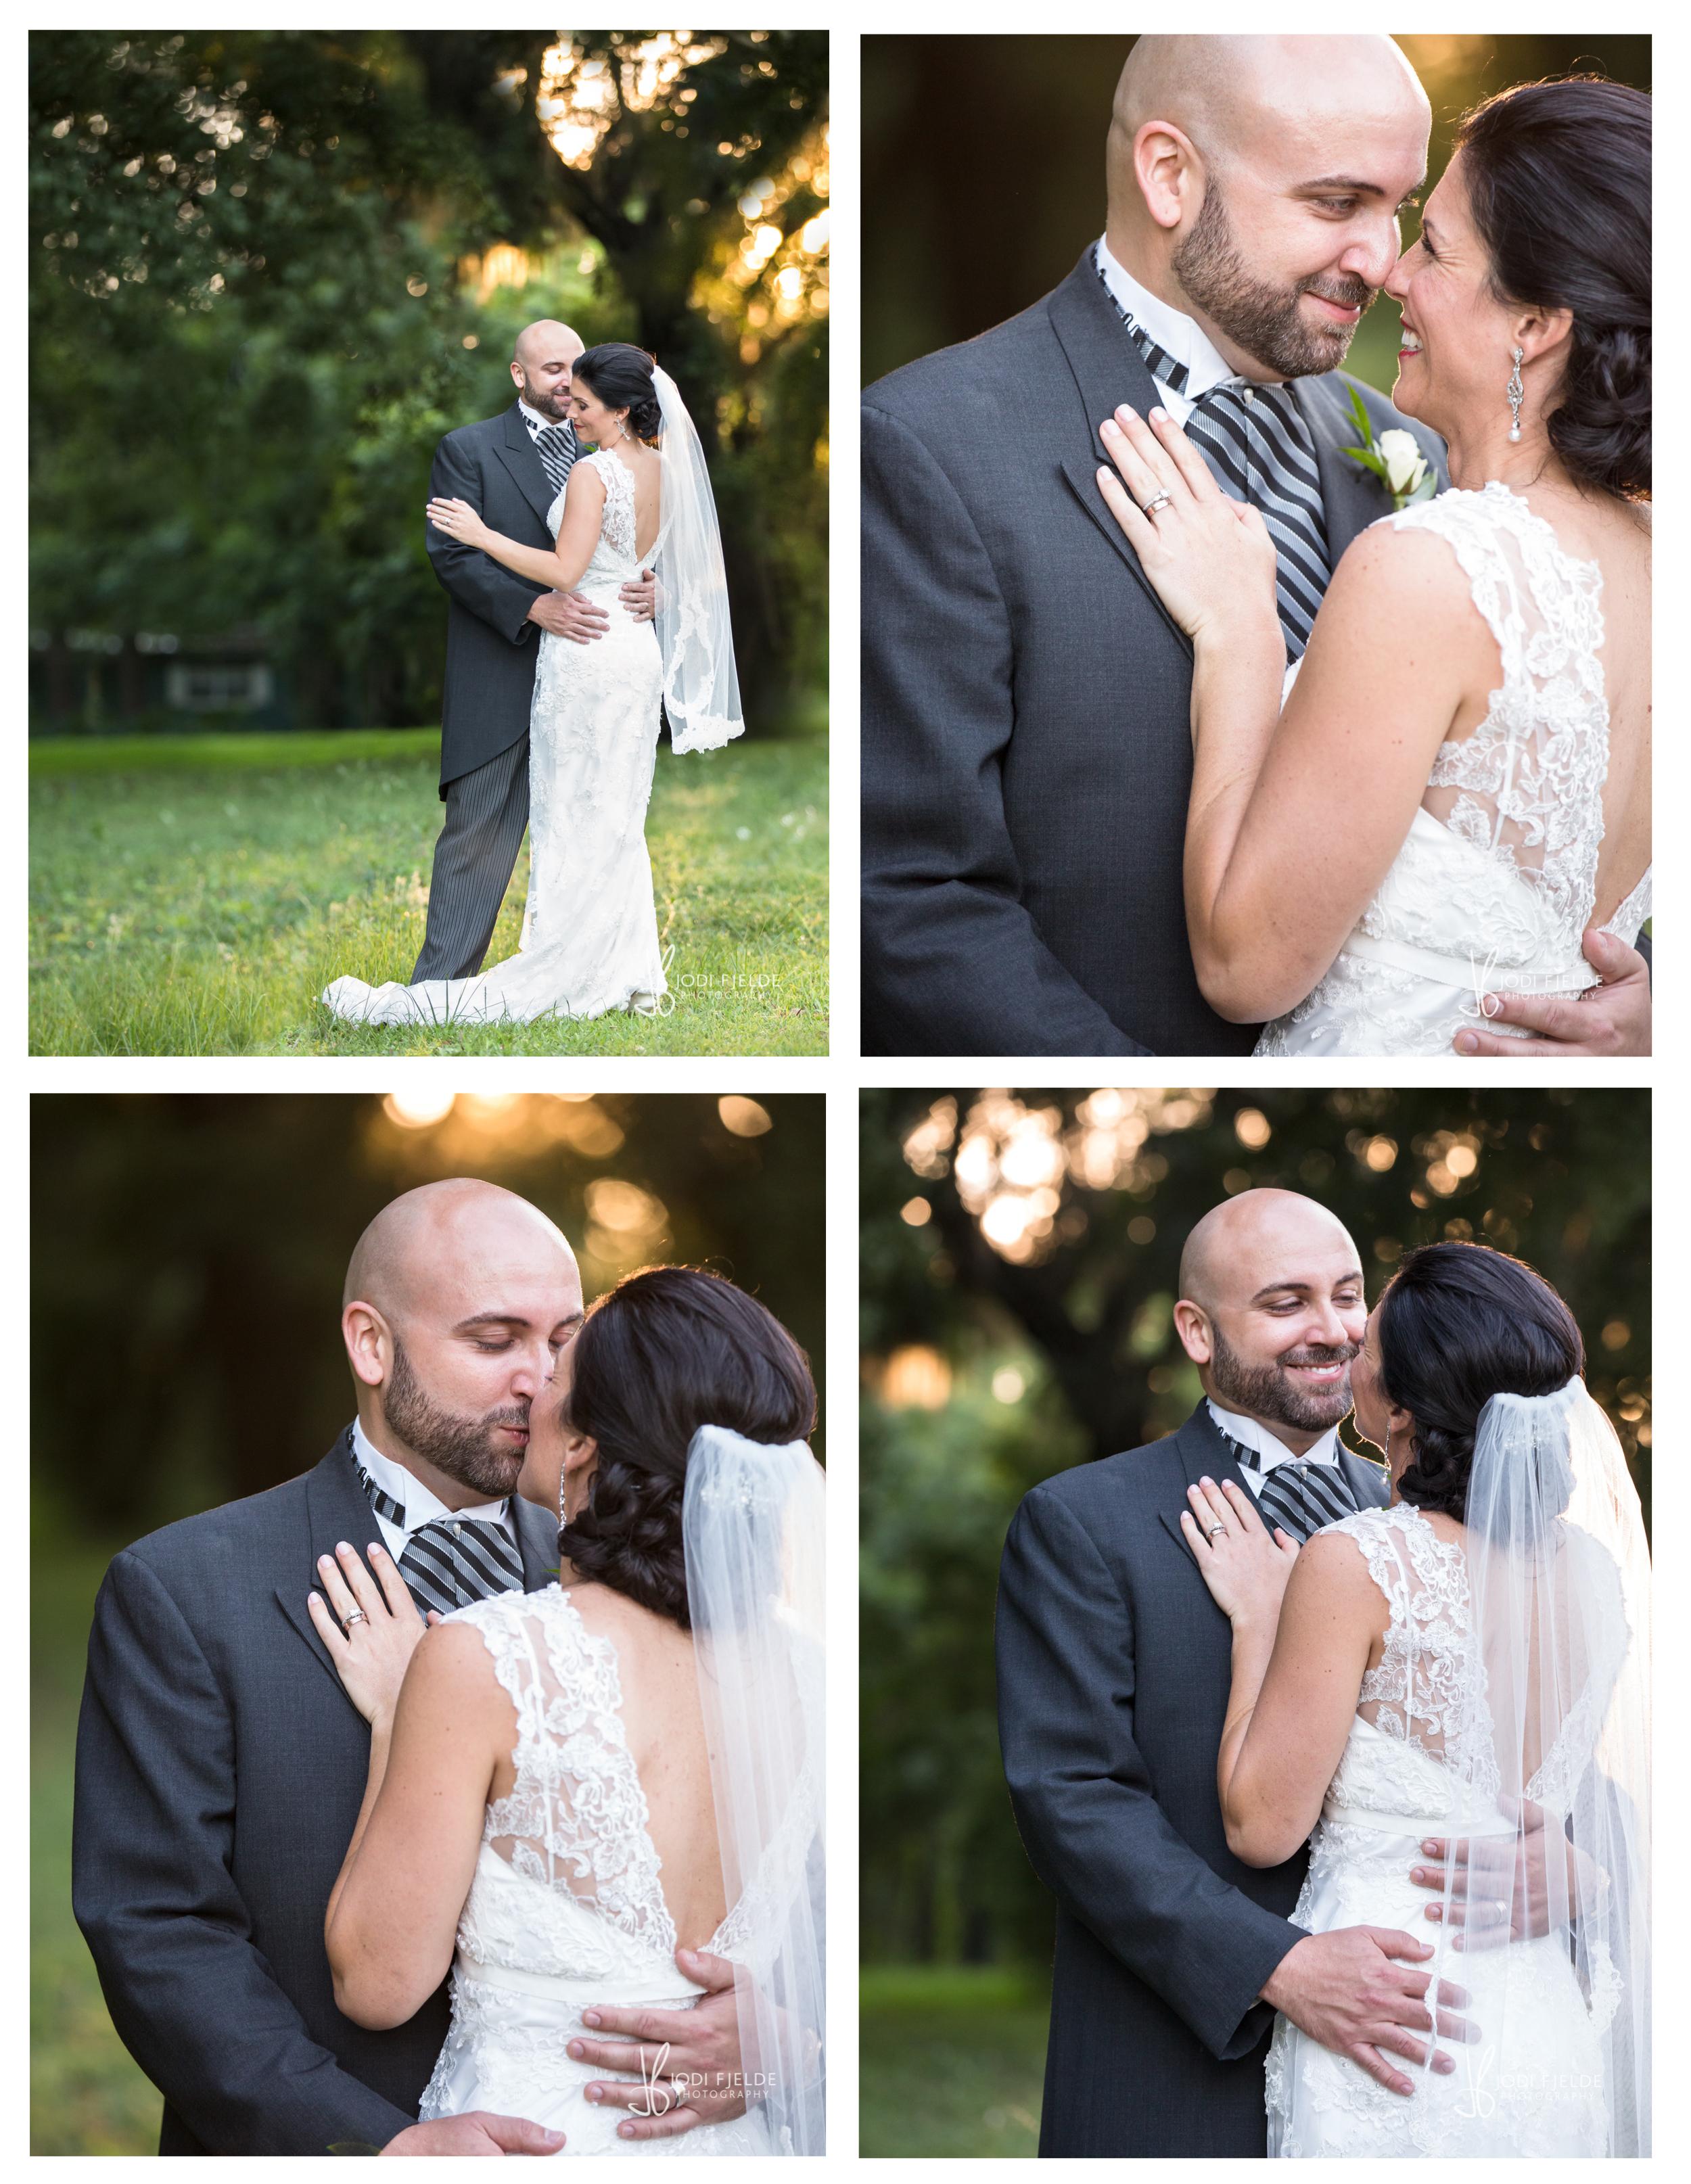 Highland_Manor_Apopka_Florida_wedding_Jackie_&_Tim_photography_jodi_Fjelde_photography-23.jpg